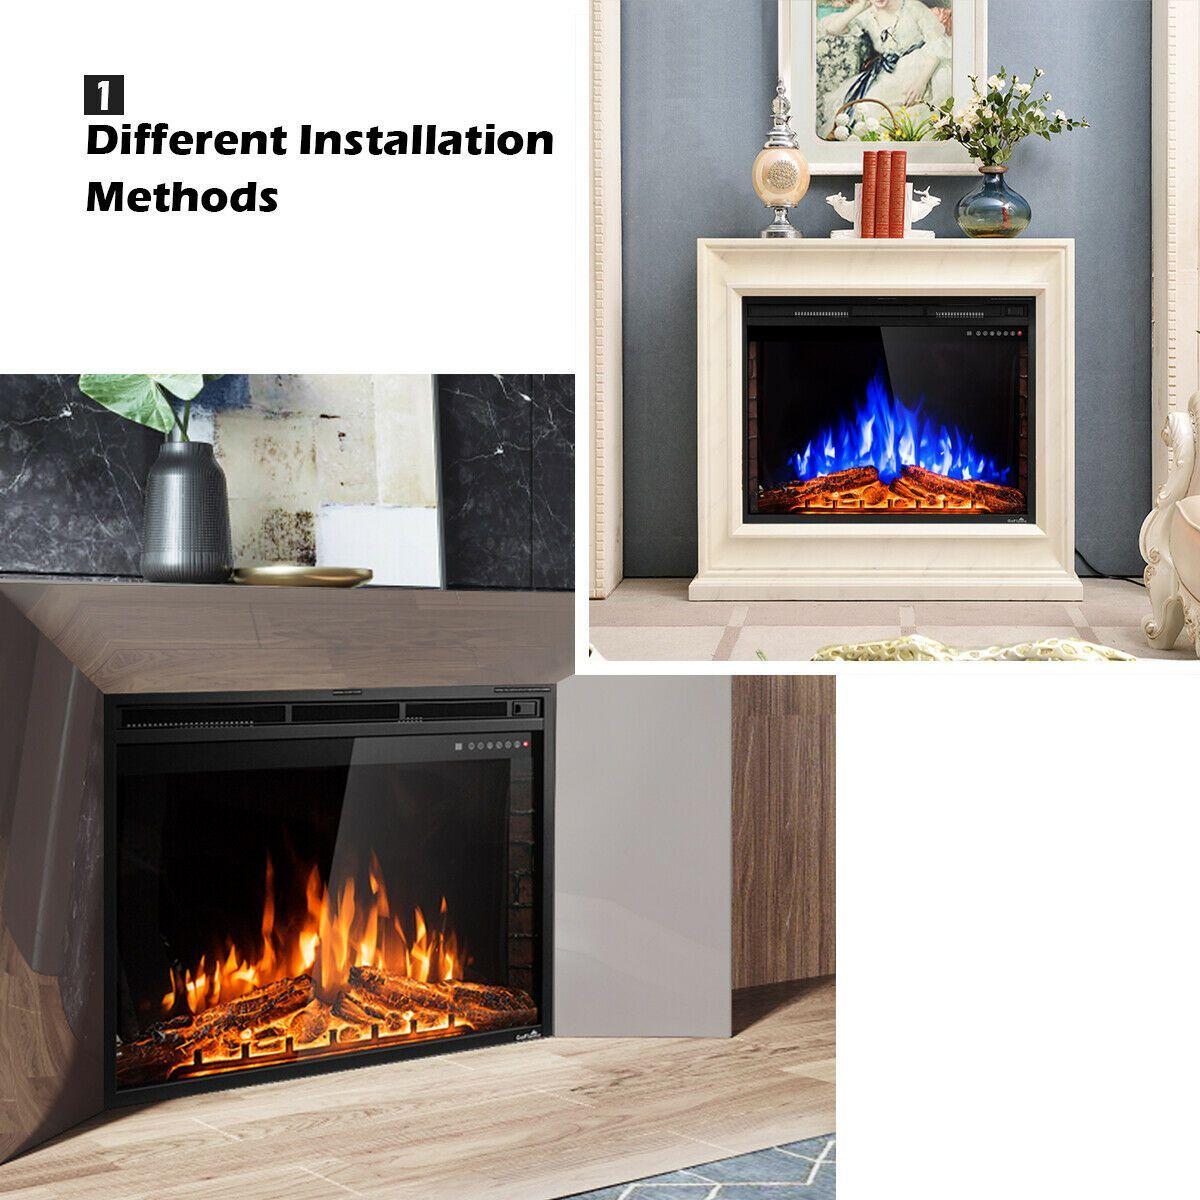 36 Elektrokamineinsatz Standofenheizung Electric Fireplace Freestanding Stove Fireplace